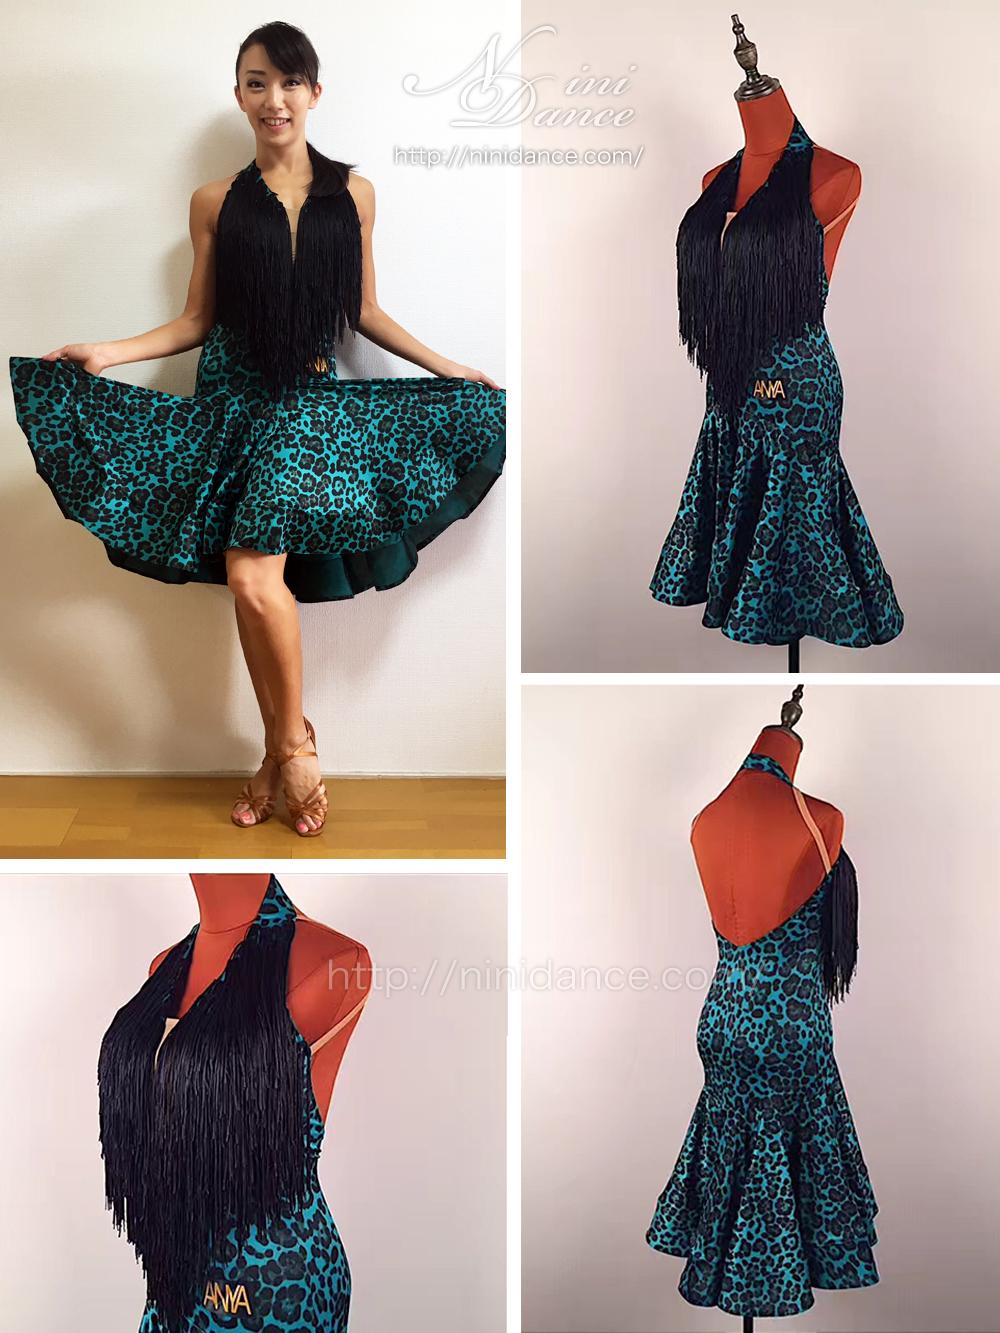 bf85d812f9051 LP050限定版柄生地のフレア裾とフリンジのラテンドレス